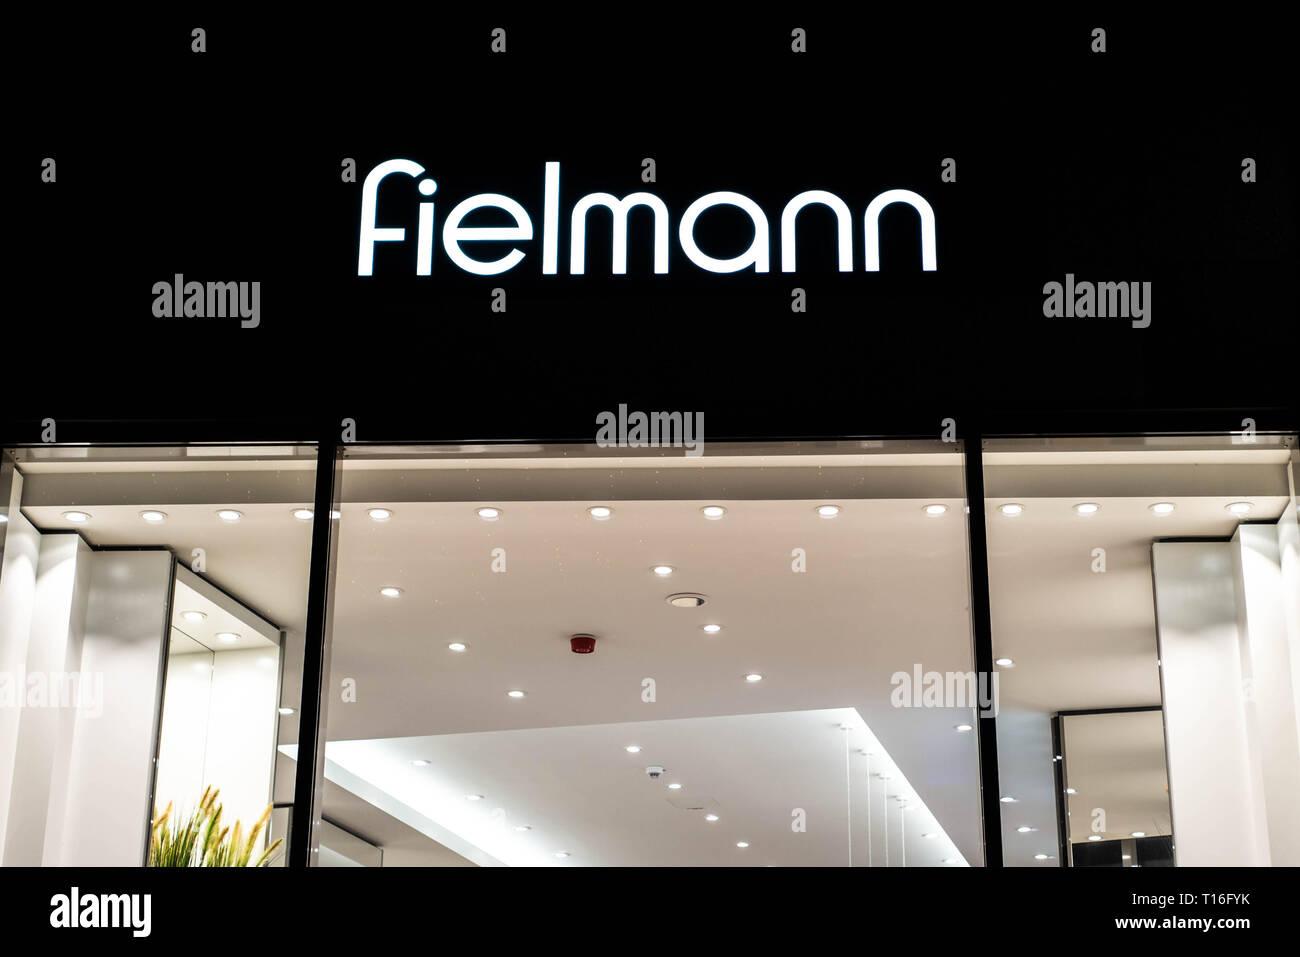 Bonn, Germany 17.12.2017 - Fielmann shop signage logo - Fielmann AG is a German optics company focusing on retail eyewear - Stock Image